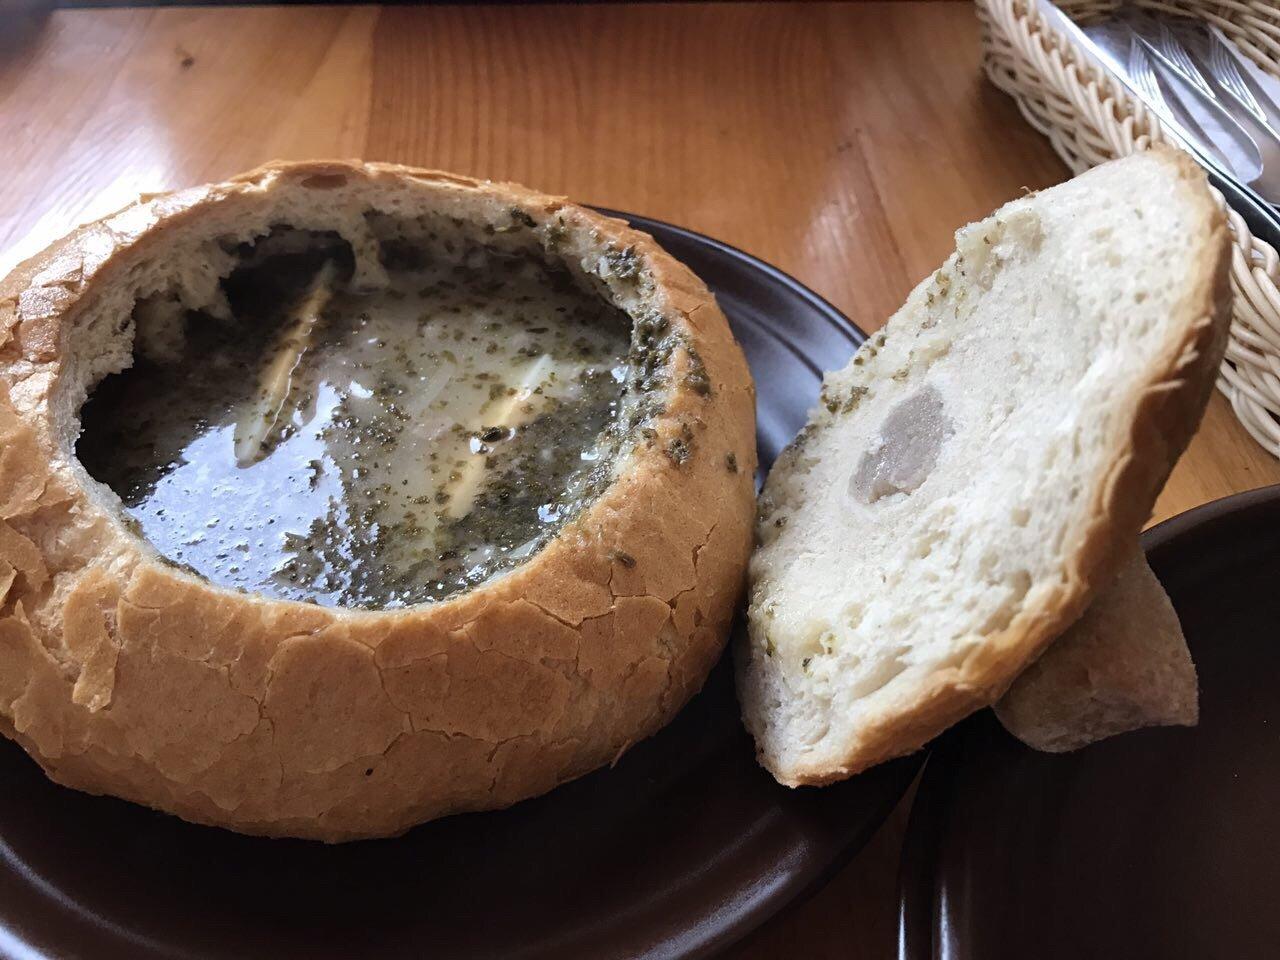 Gościniec – White sausage soup